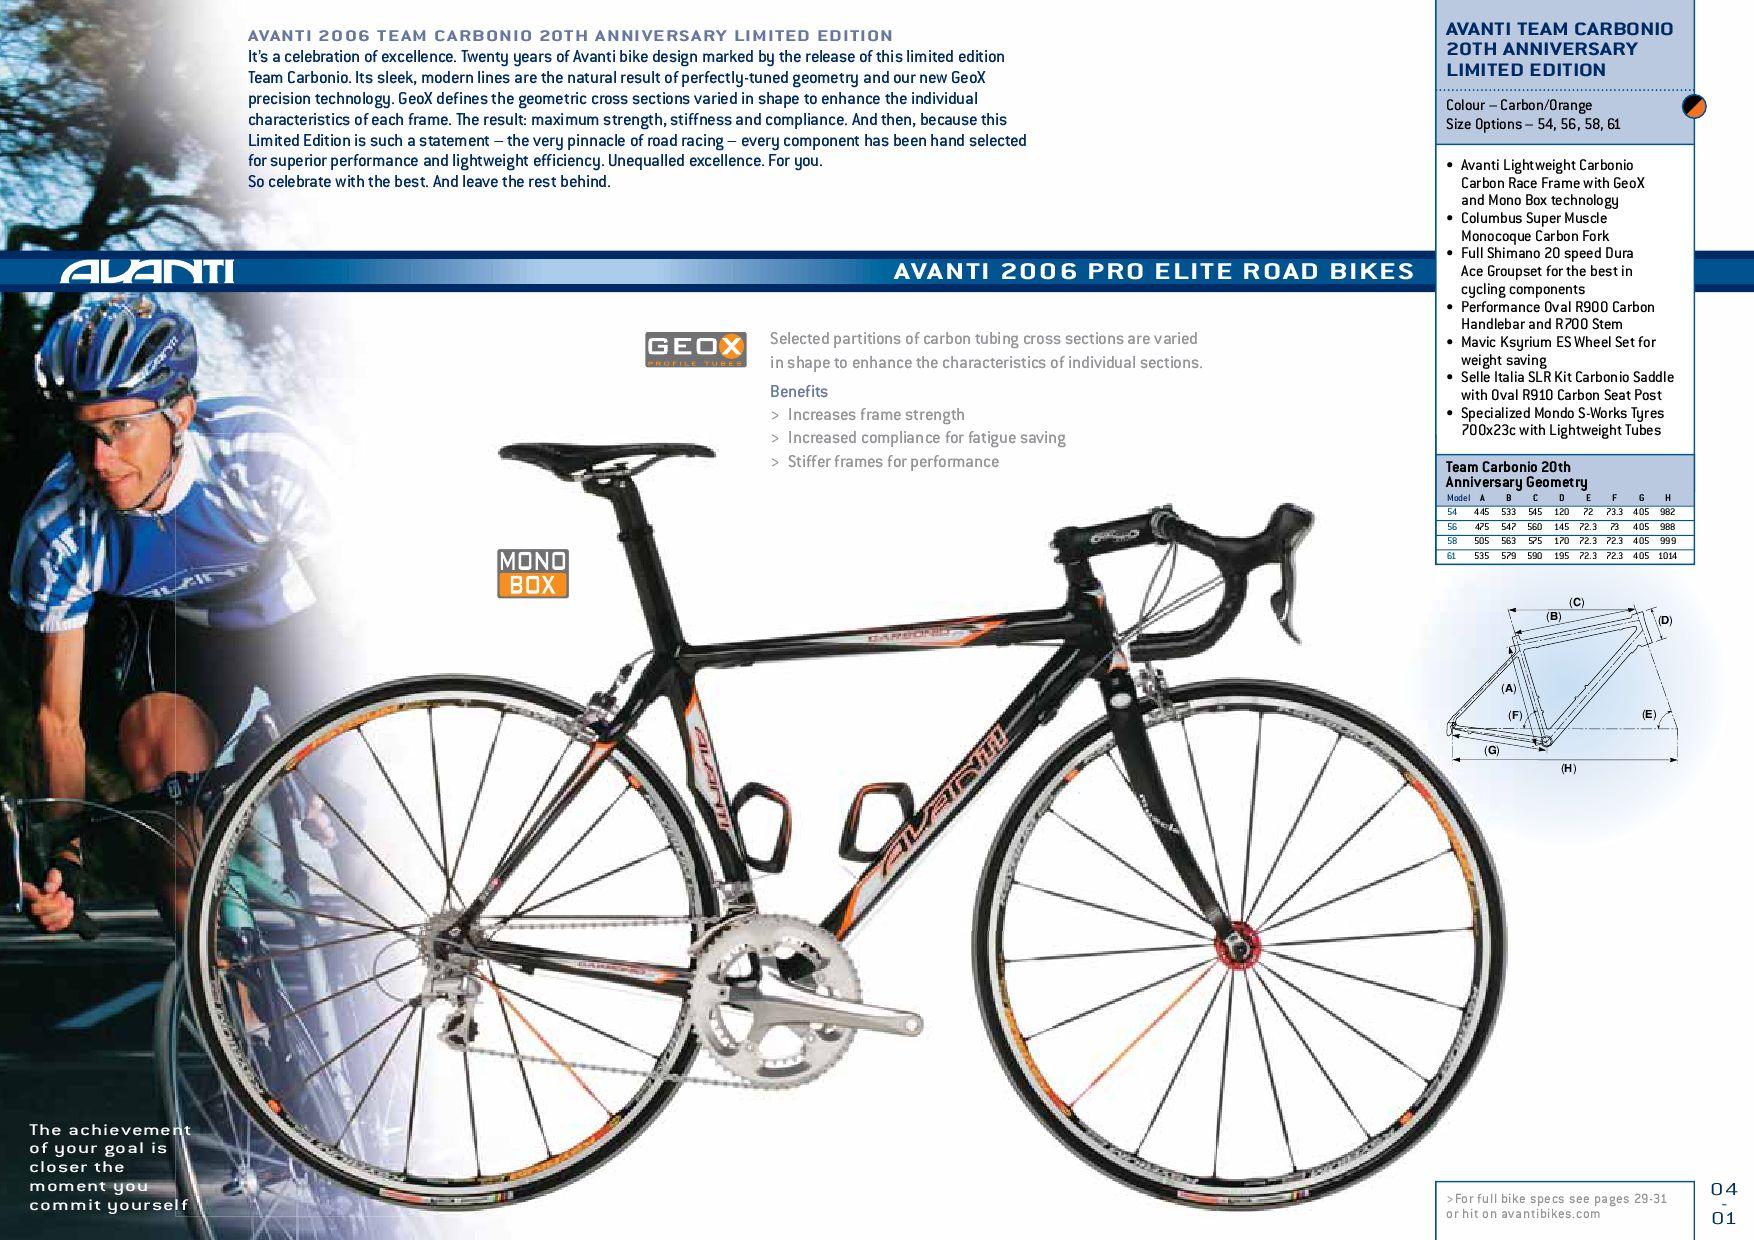 2006 Avanti Bike Catalogue by AvantiPlus Cycles - issuu